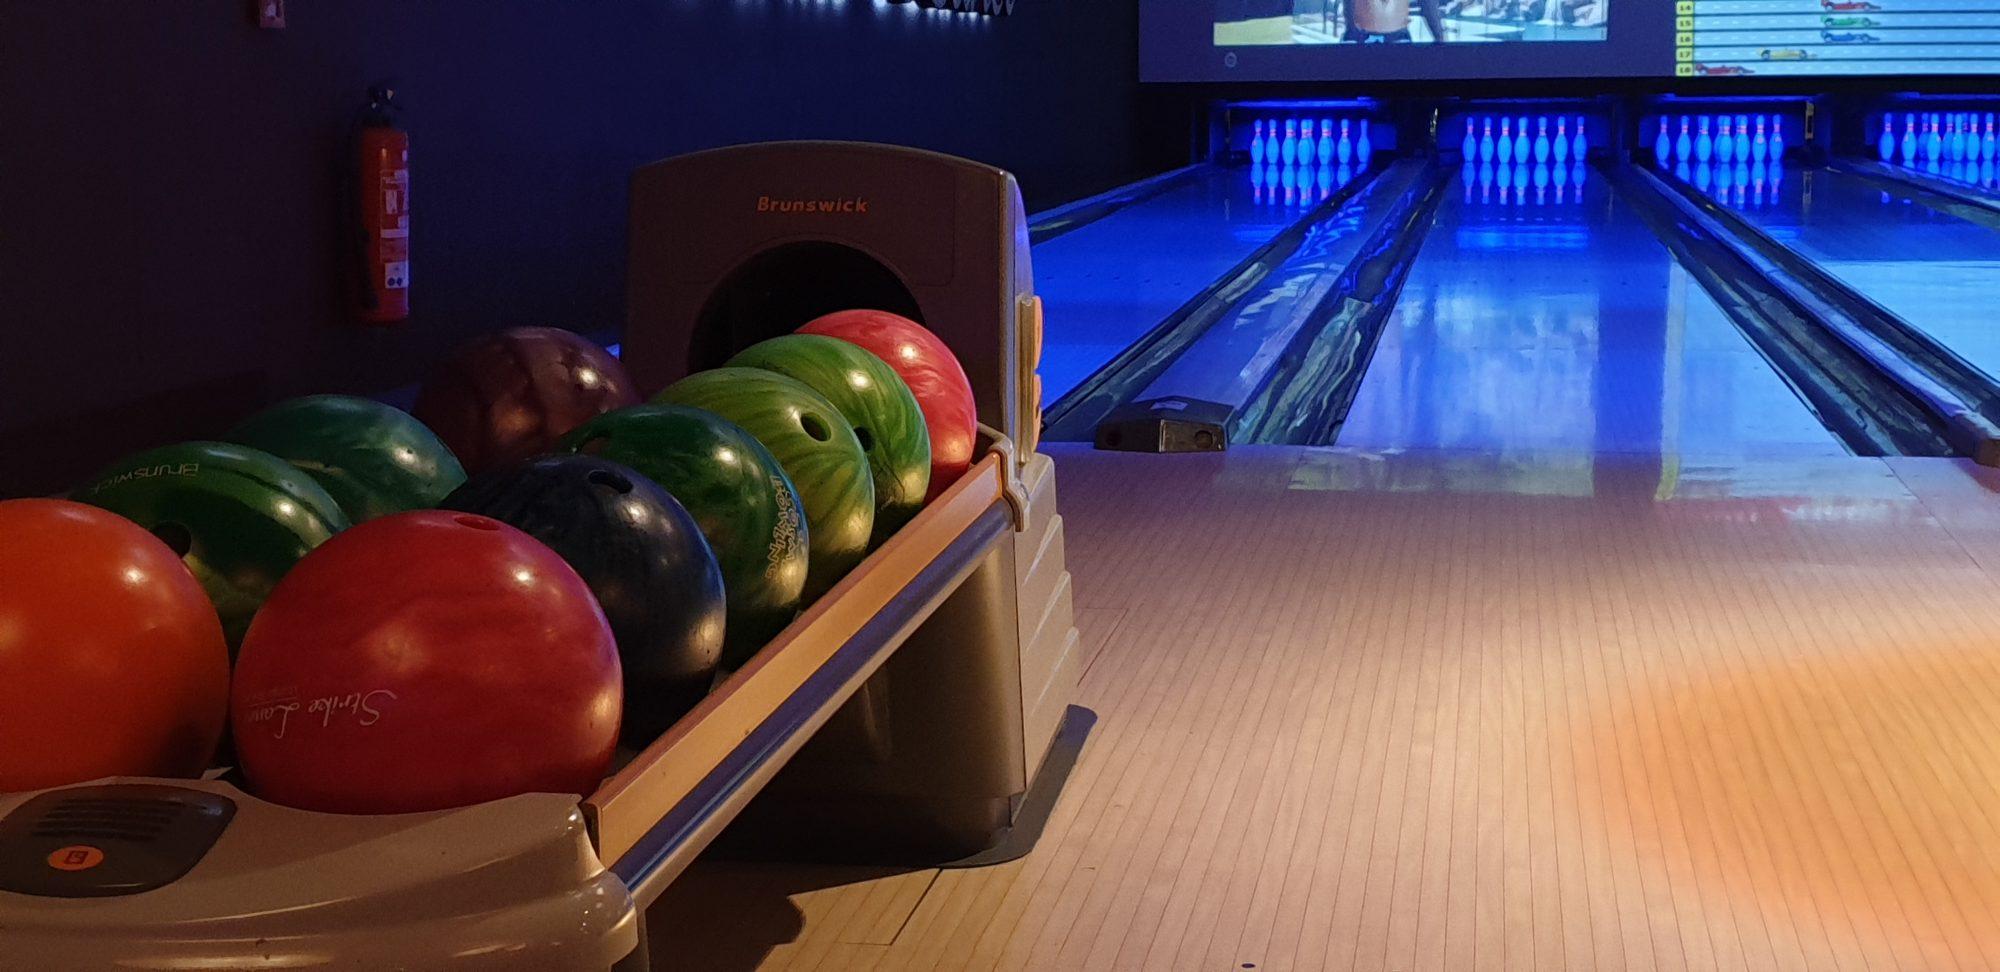 Foto der Bowlingbahn beim Teamevent